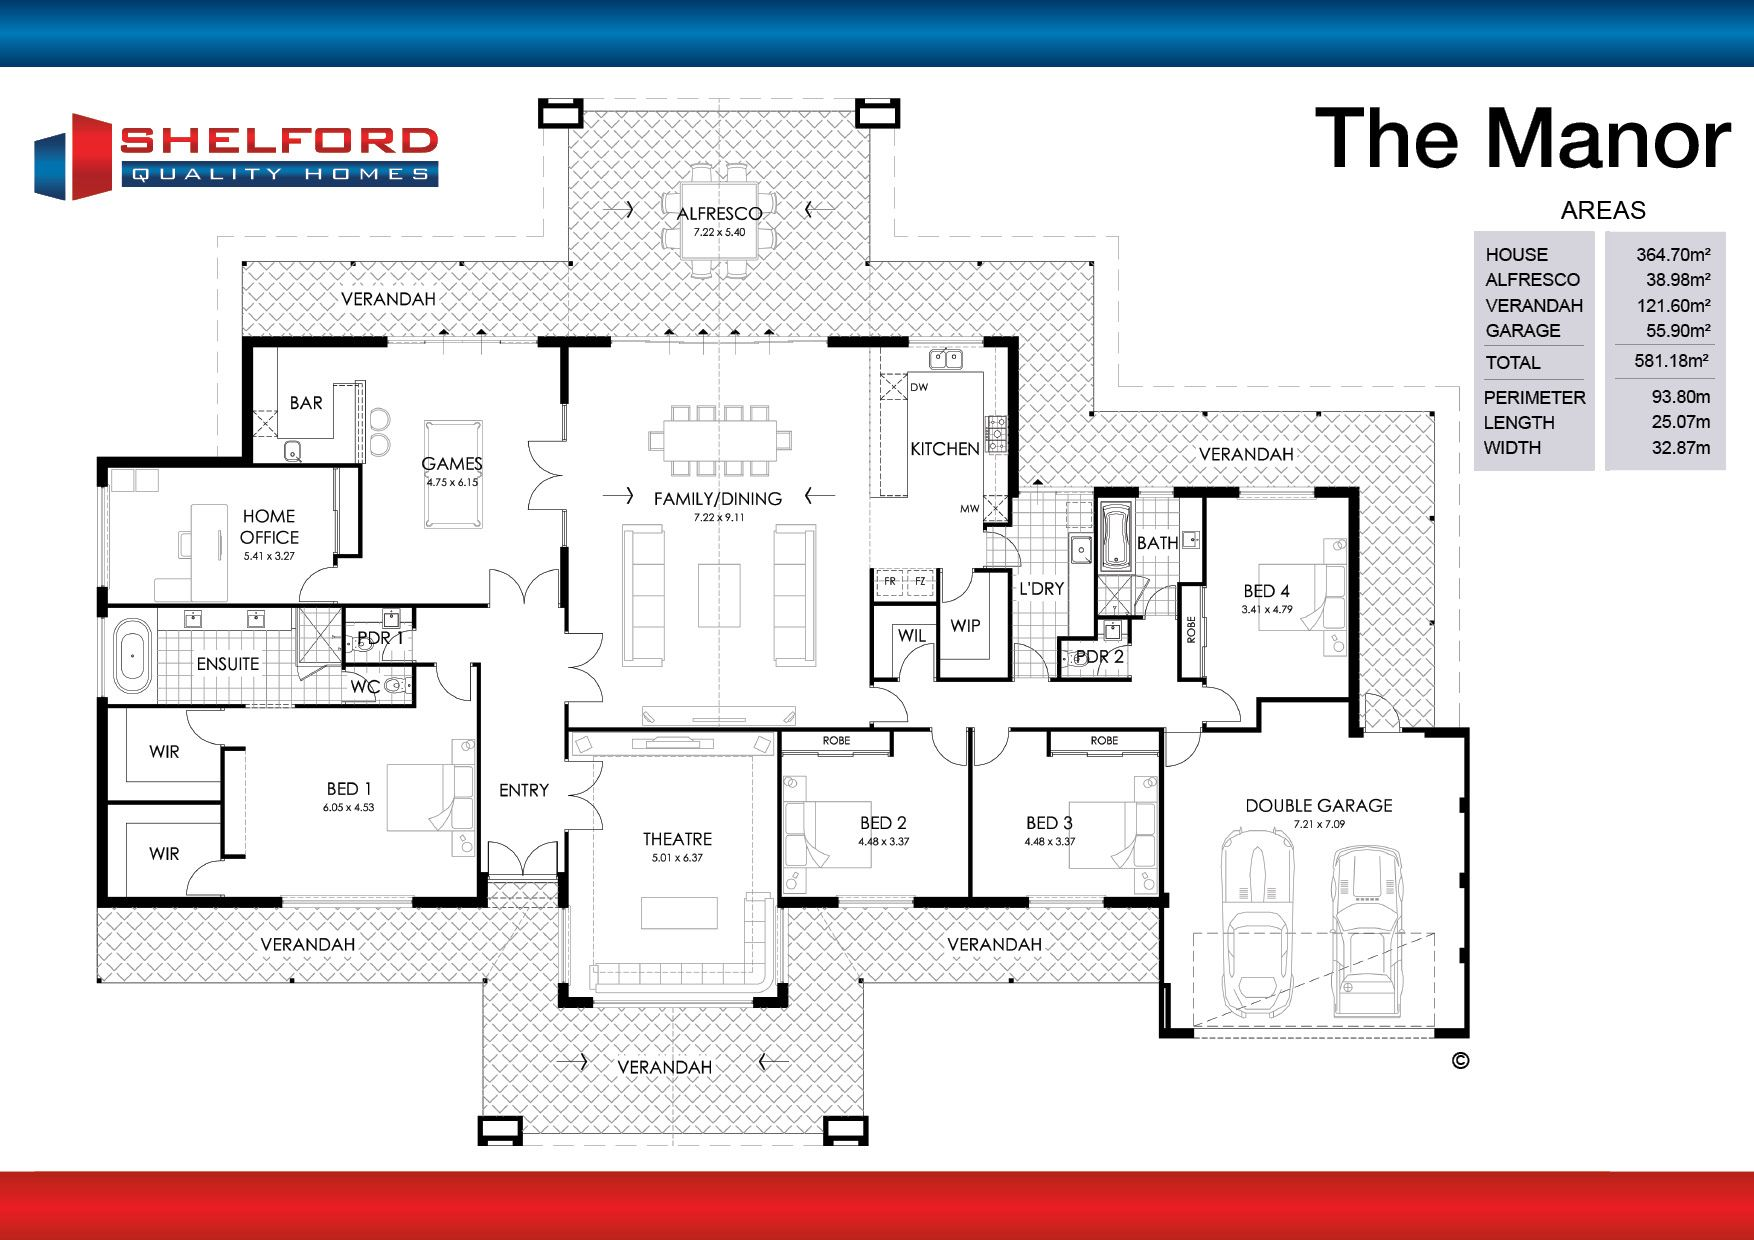 The Manor Web Plan Jpg 1754 1240 Floor Plans House Design Home Design Floor Plans